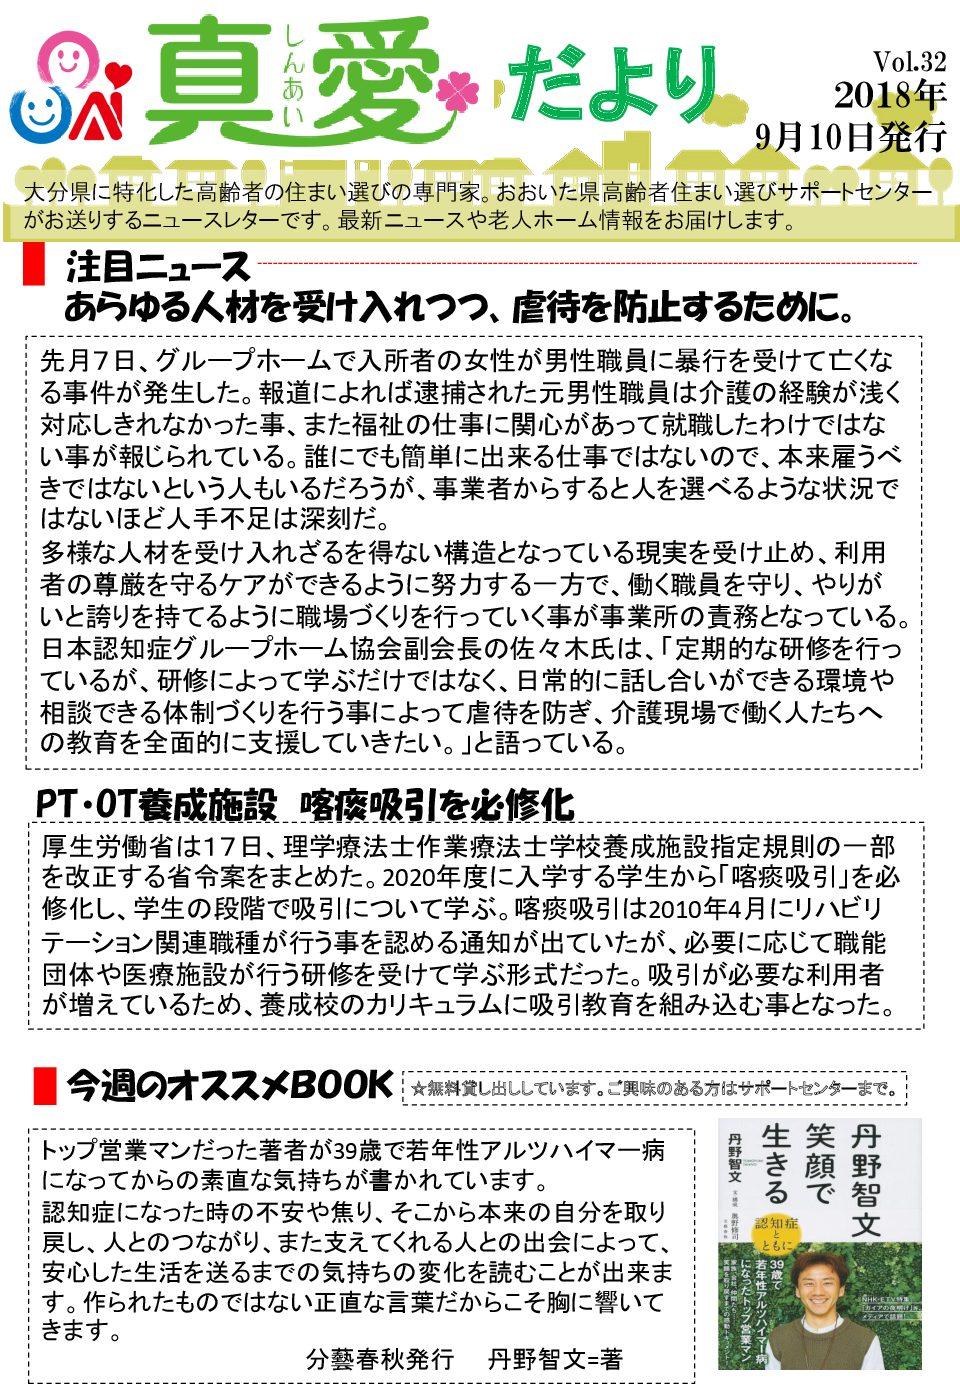 【Vol.32】 2018.09.10発行